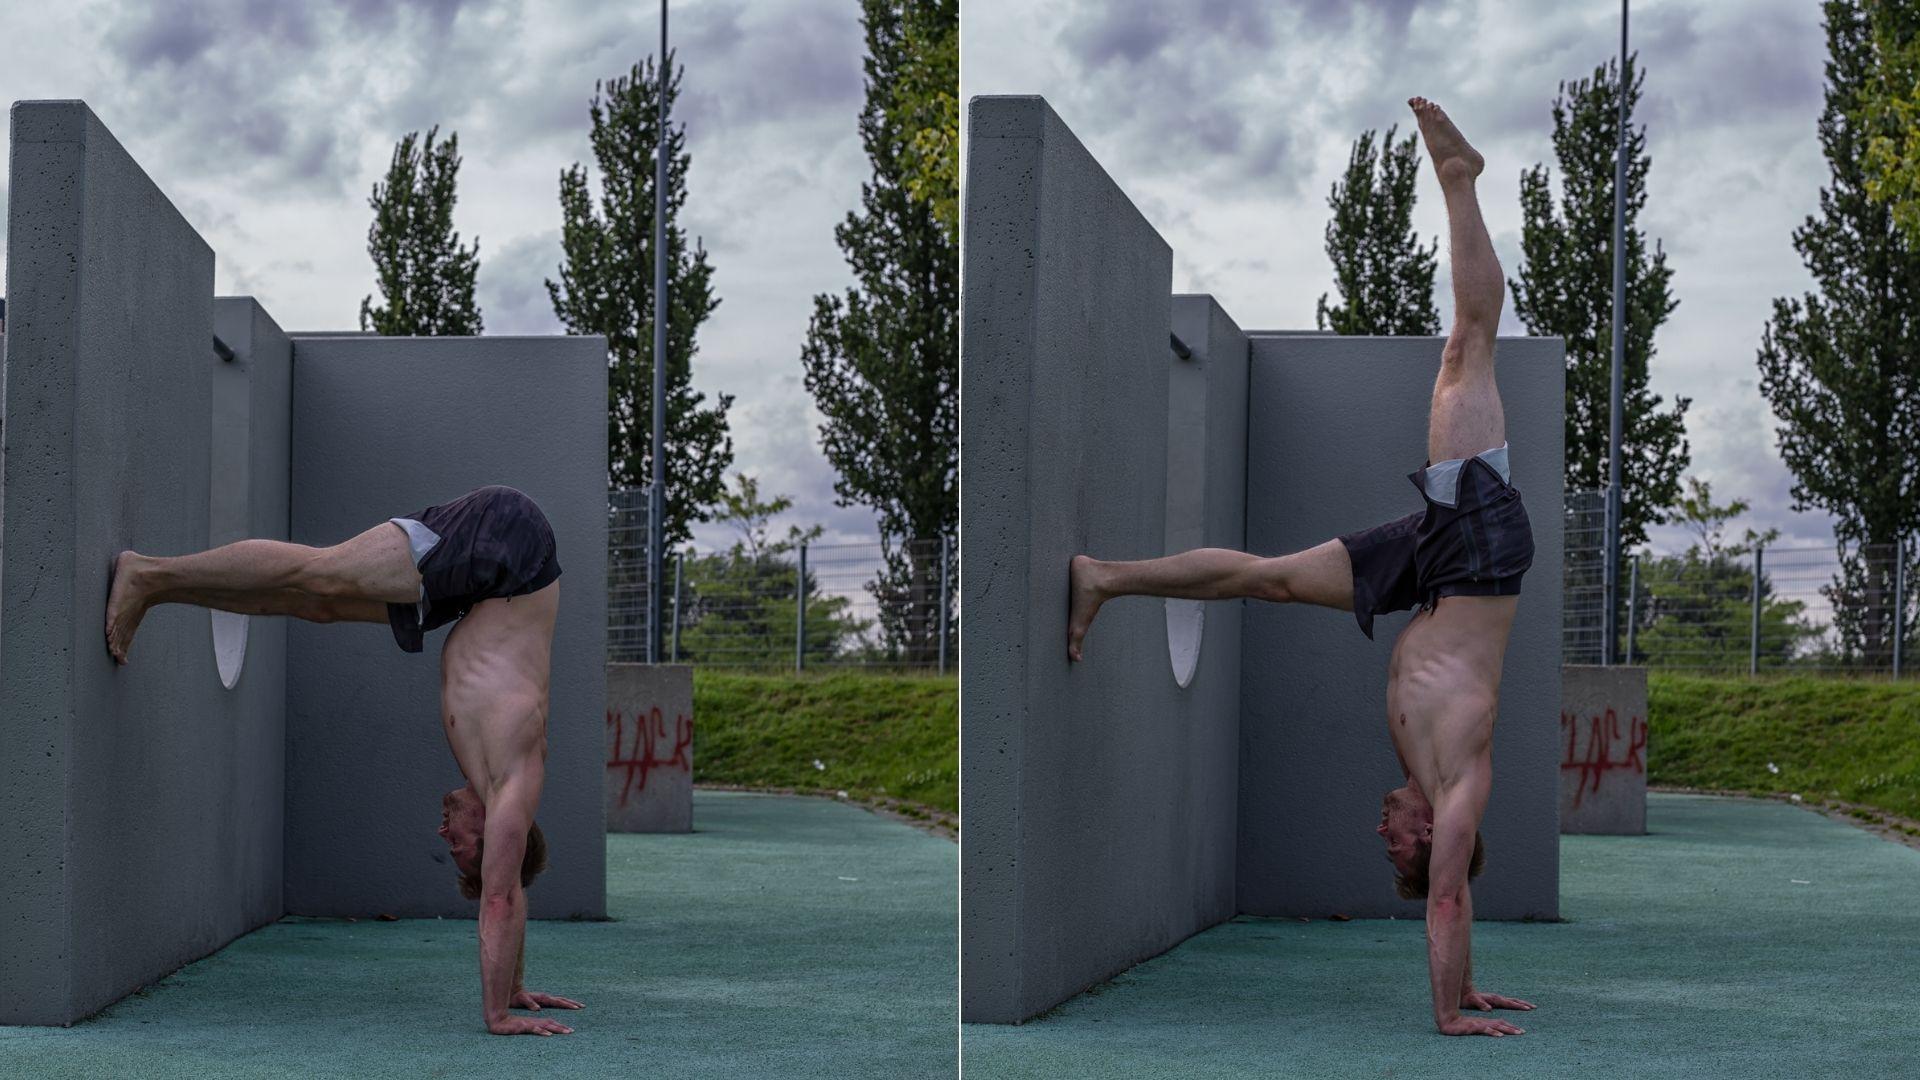 07 Handstand üben an der Wand